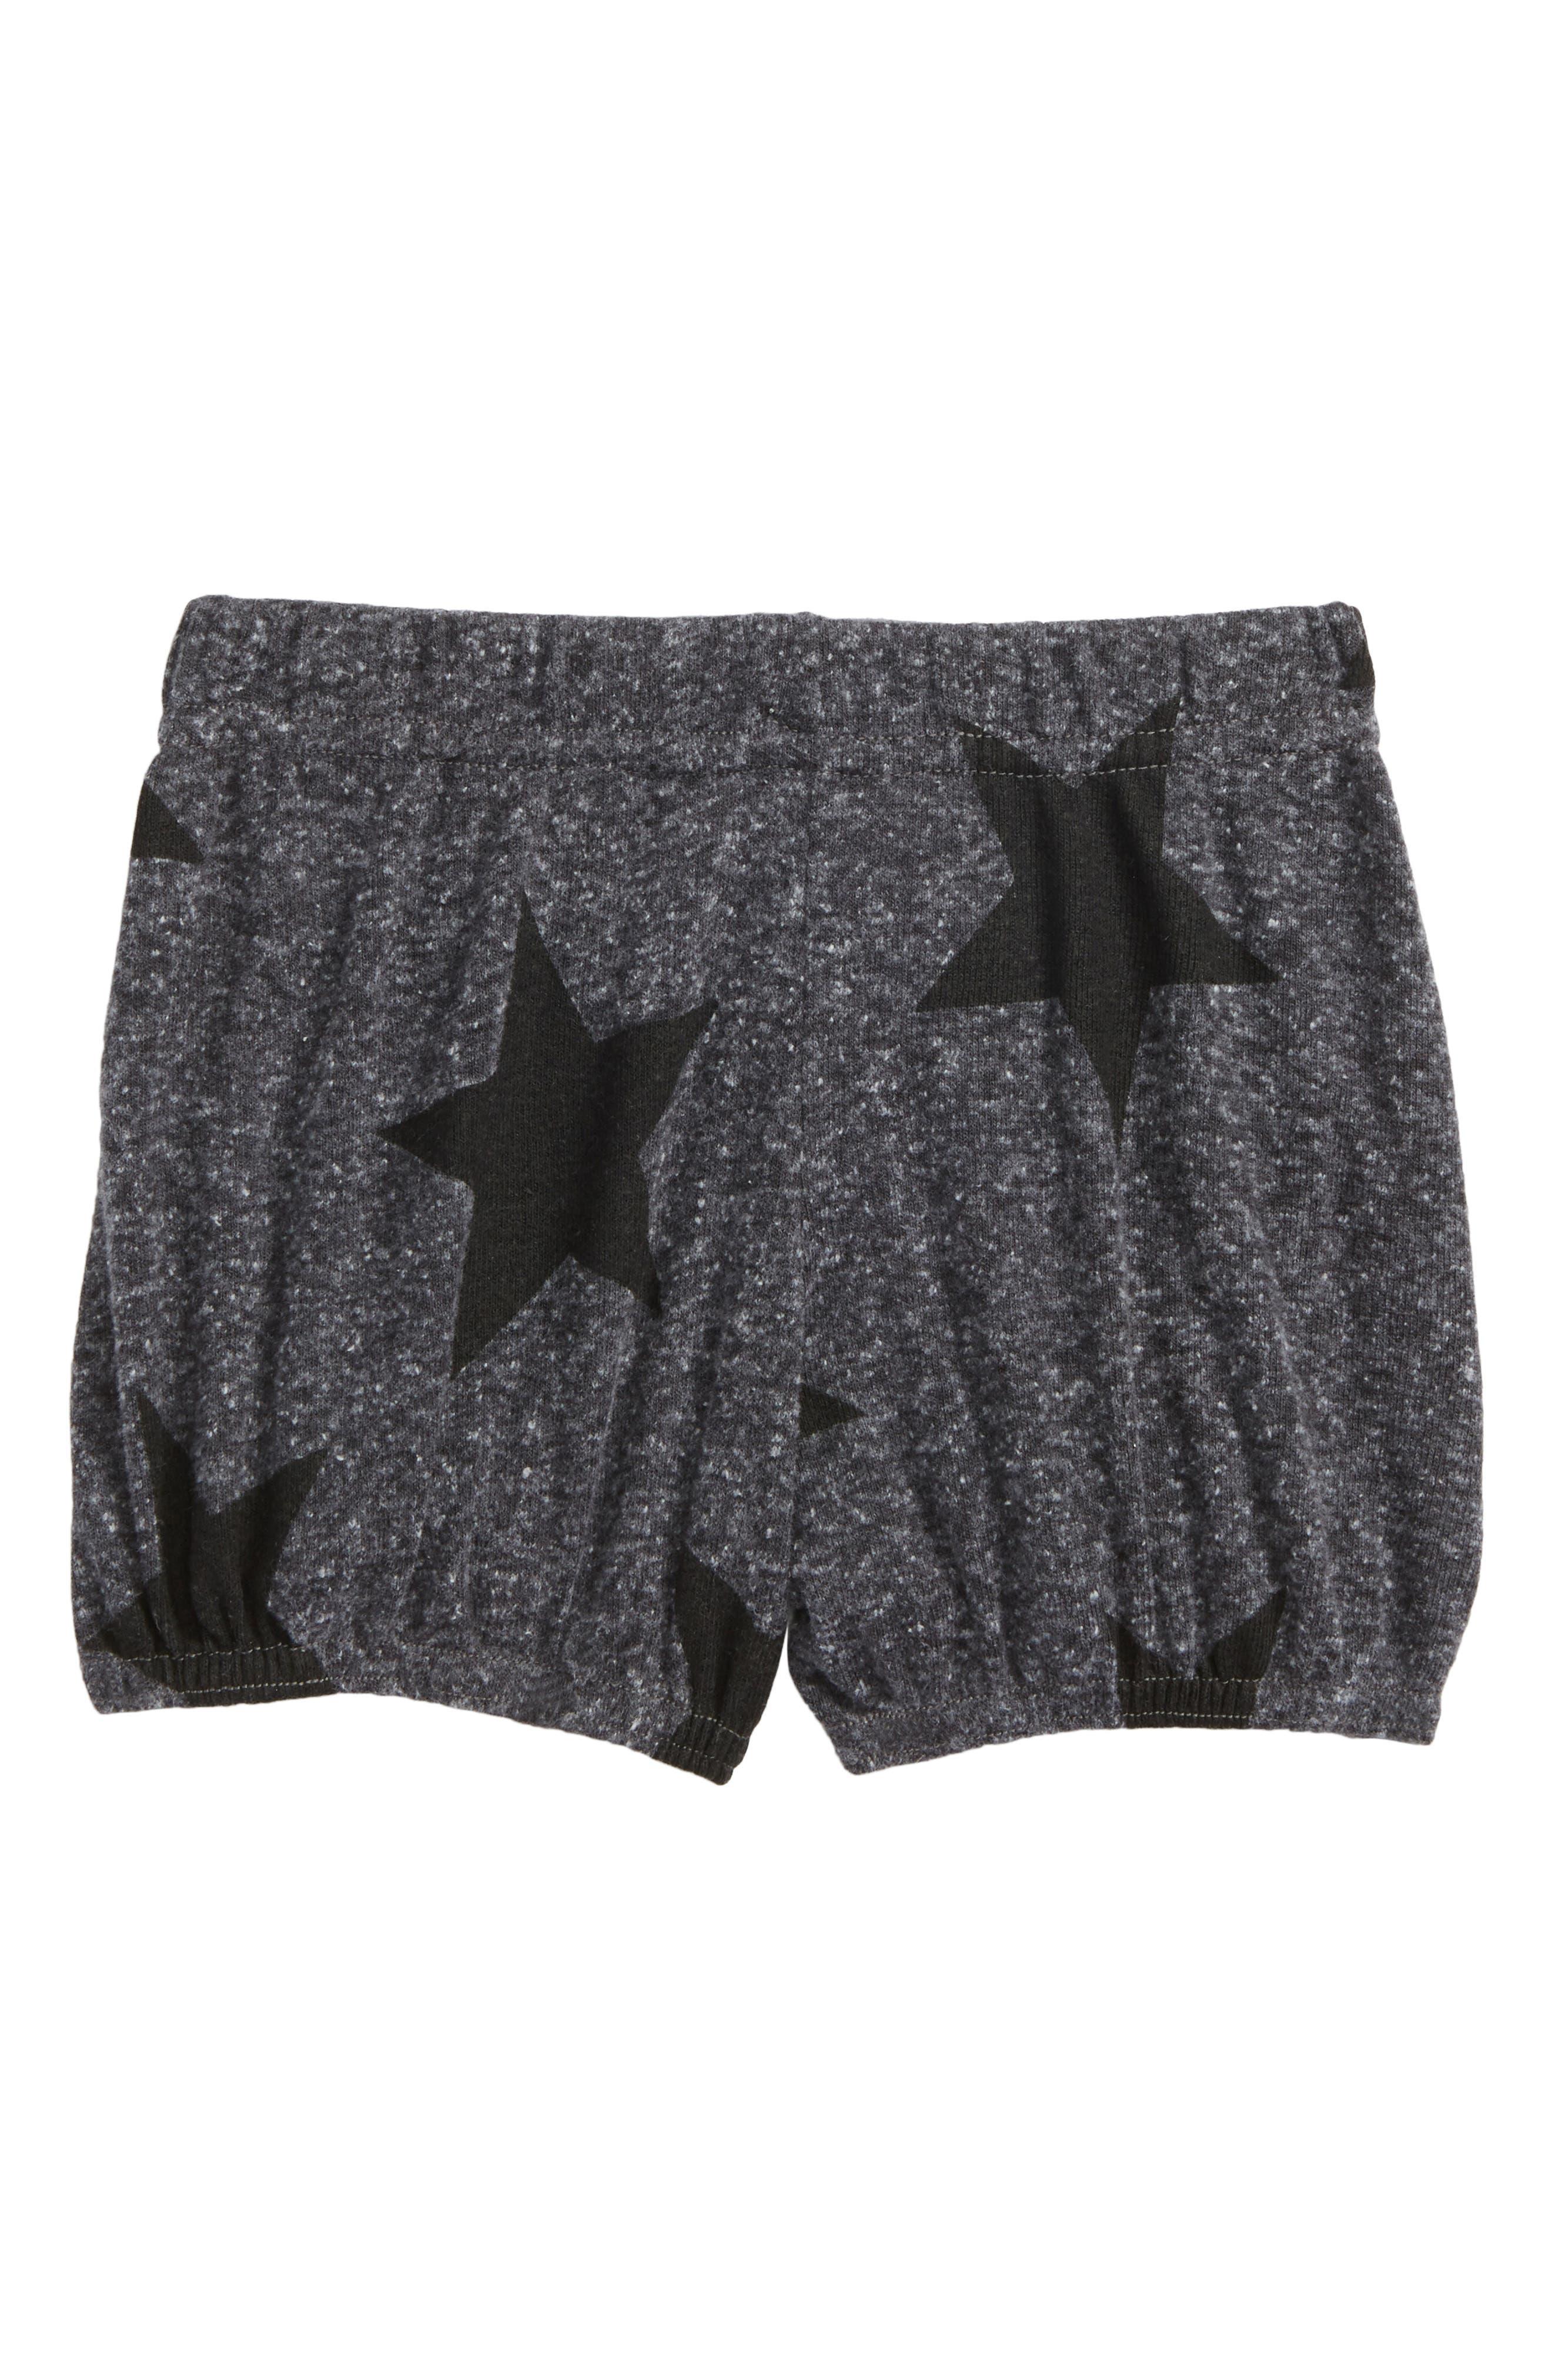 Star Print Yoga Shorts,                         Main,                         color, 021